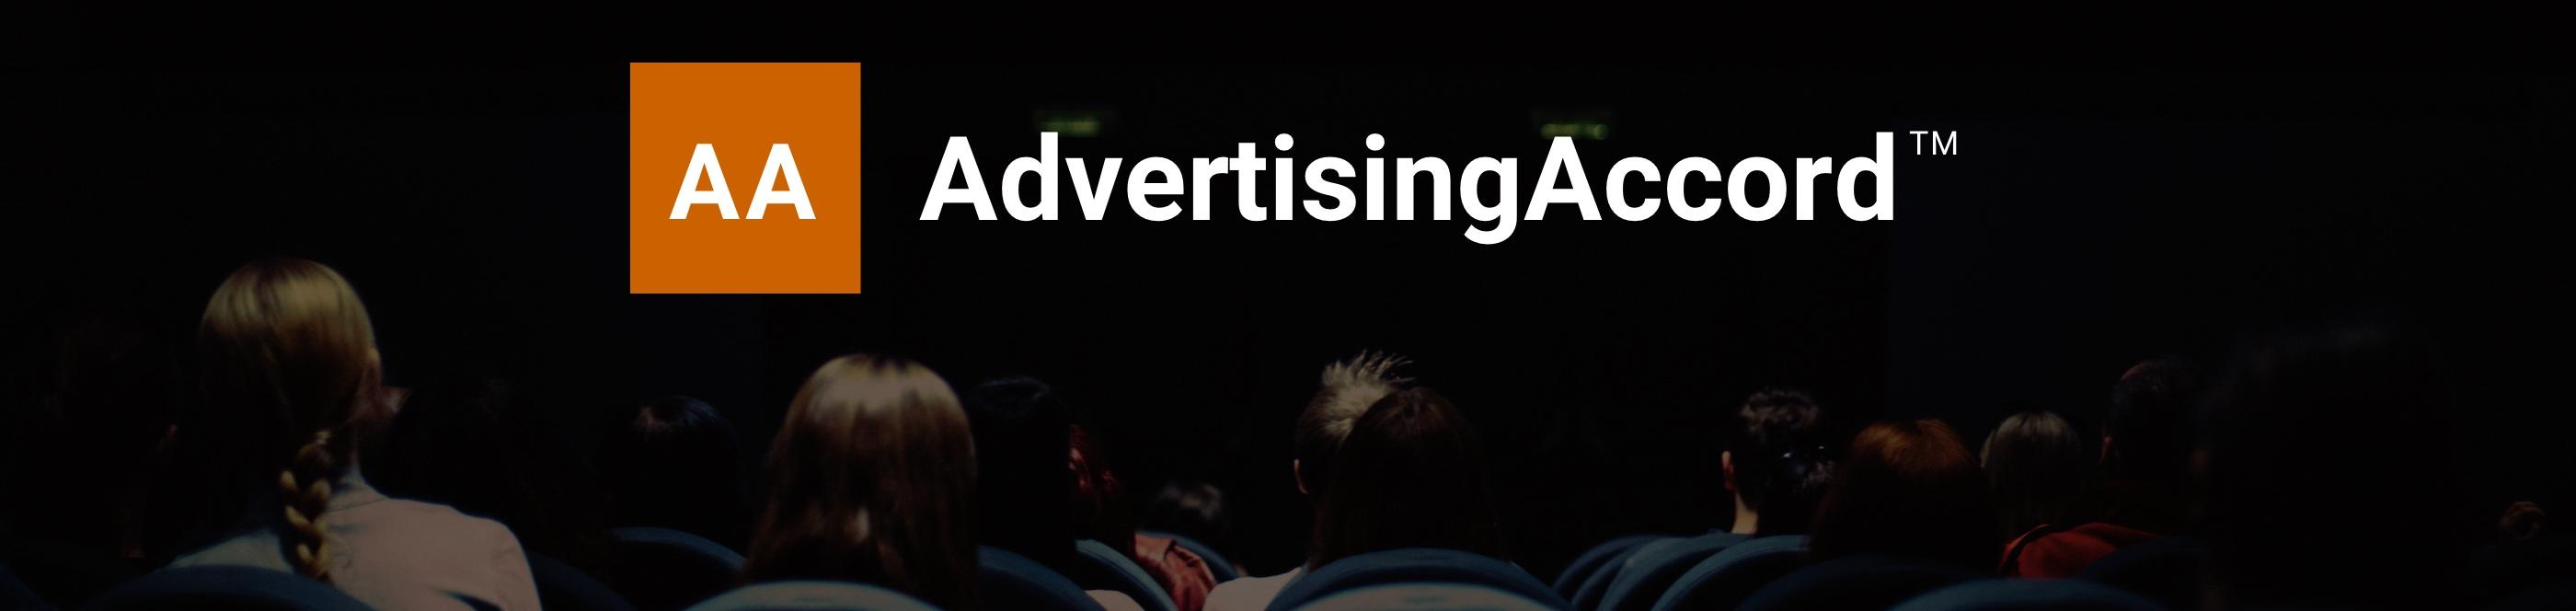 Advertising Accord Cinema Advertising